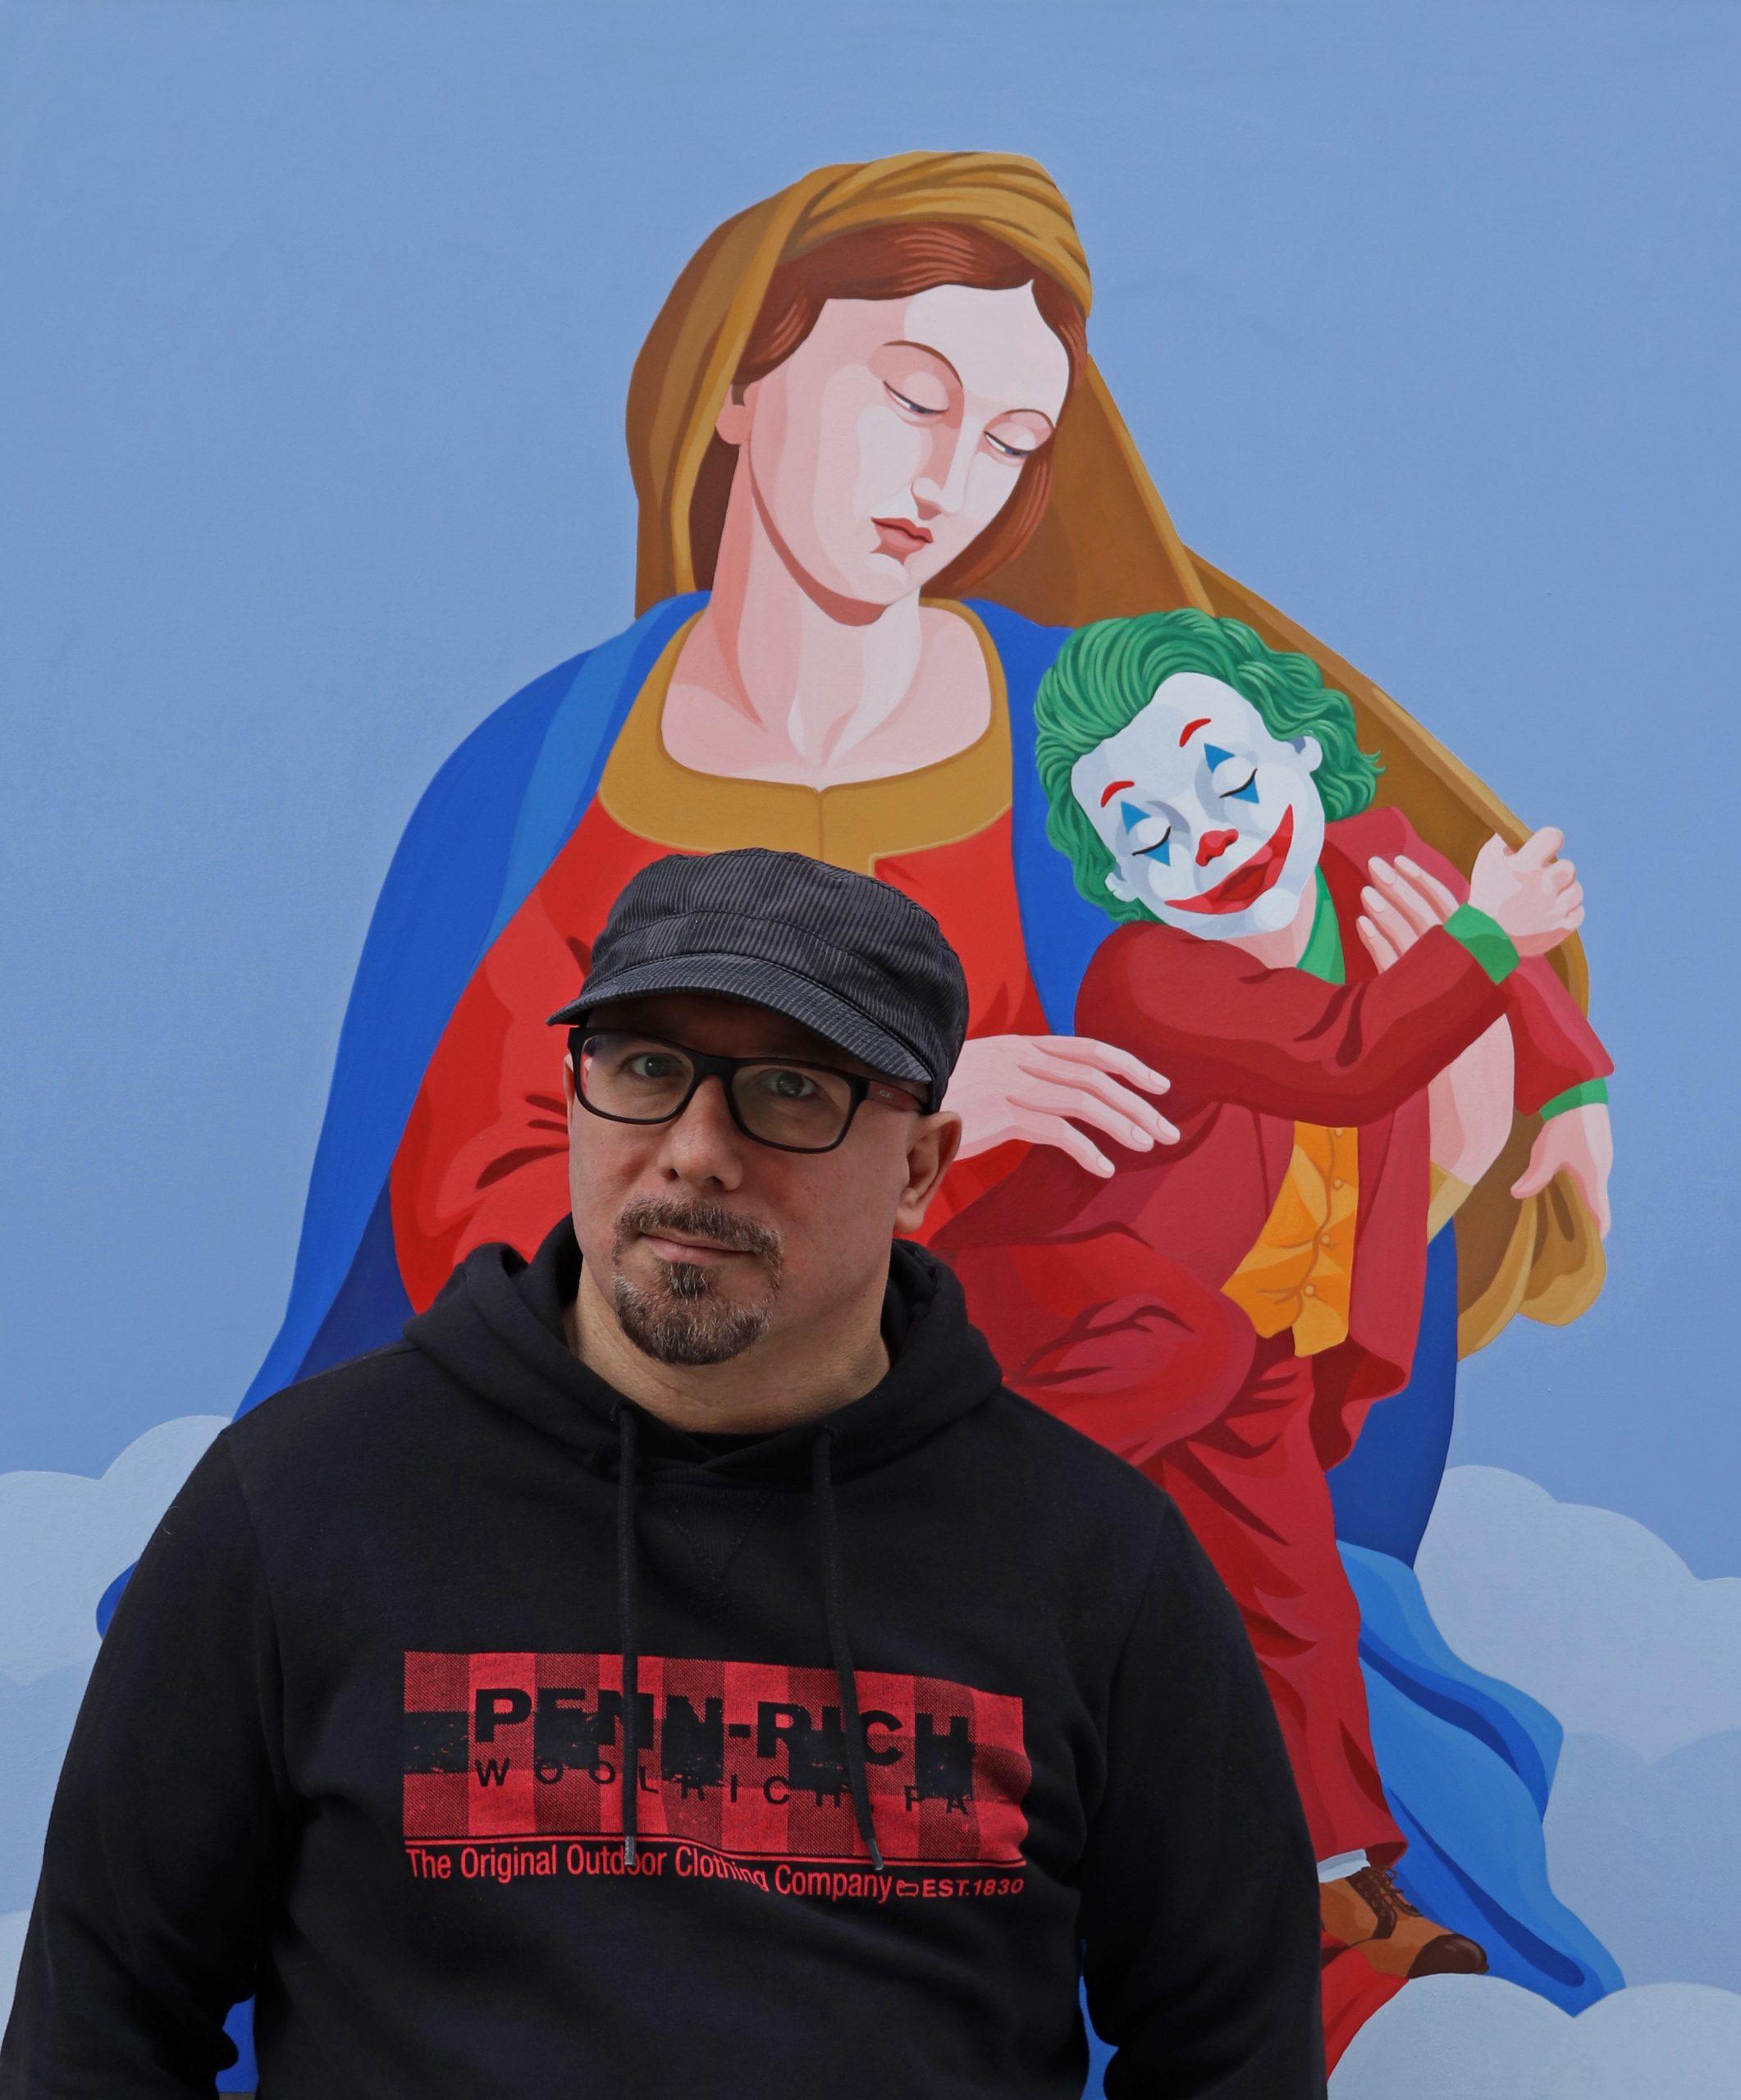 Giuseppe Veneziano, artista. La sua storia di quarantena